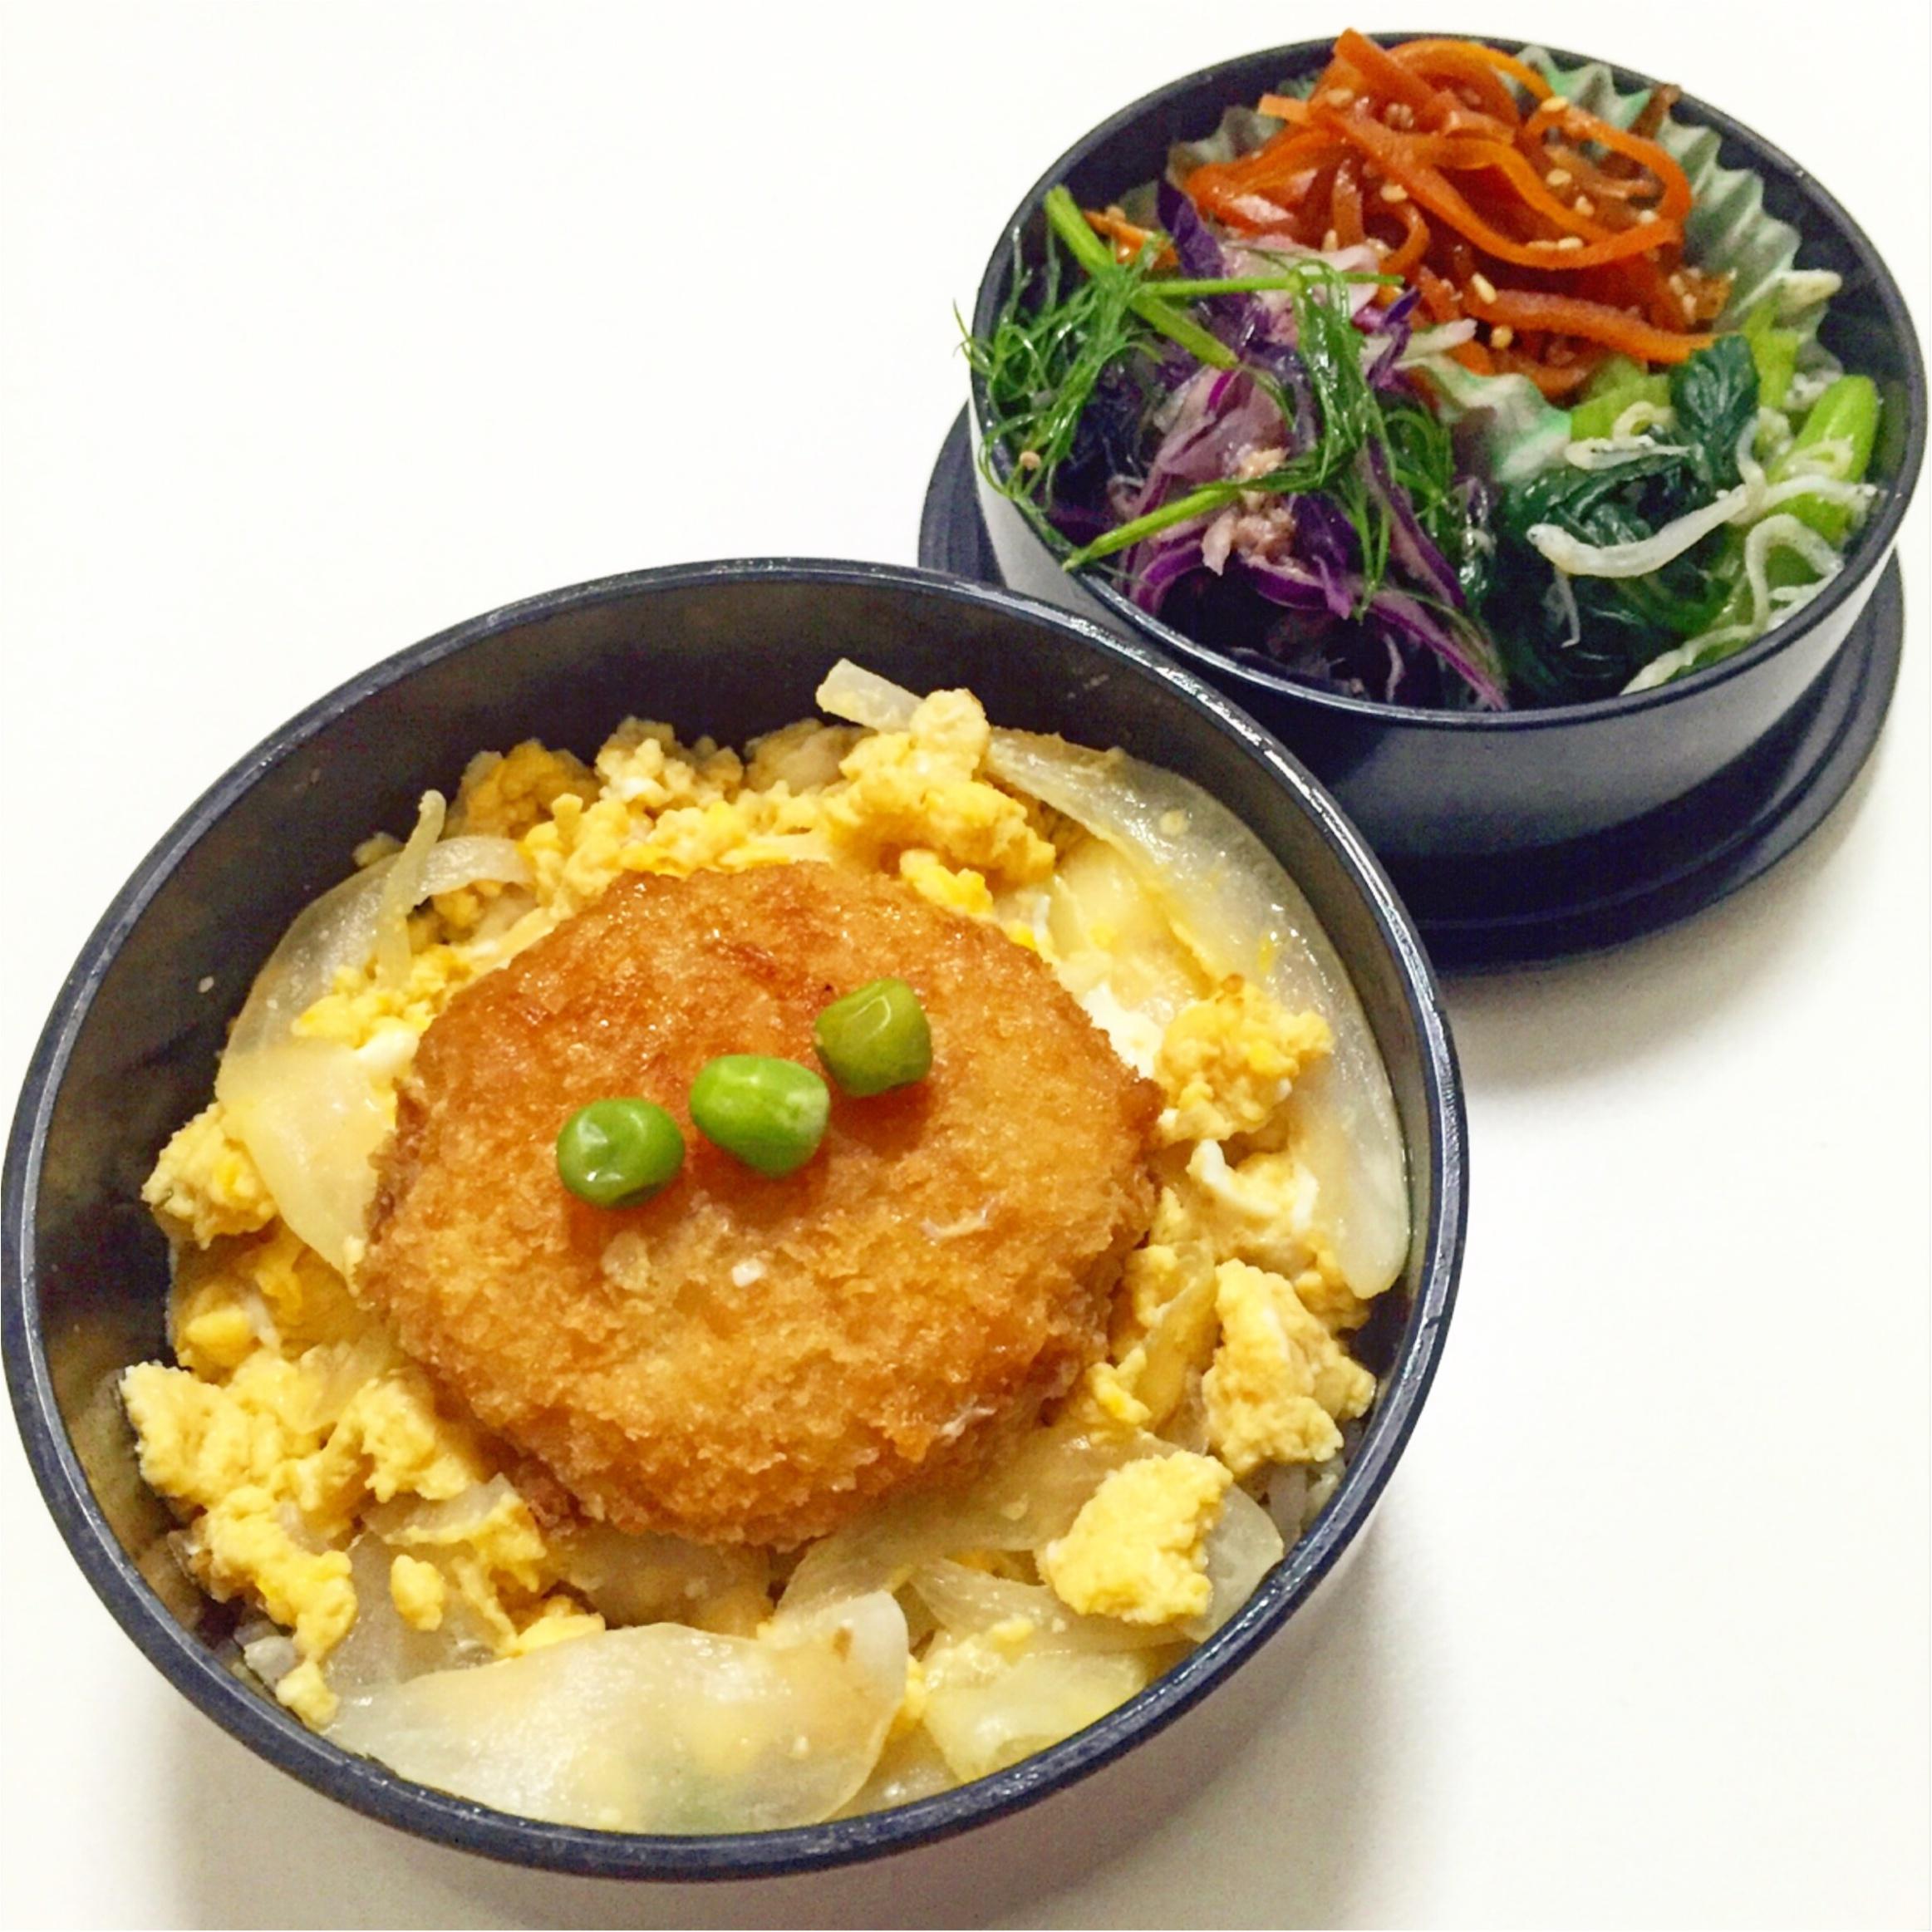 MORE7月号掲載サラダレシピフル活用!1週間の常備菜とお弁当***さっこ_5